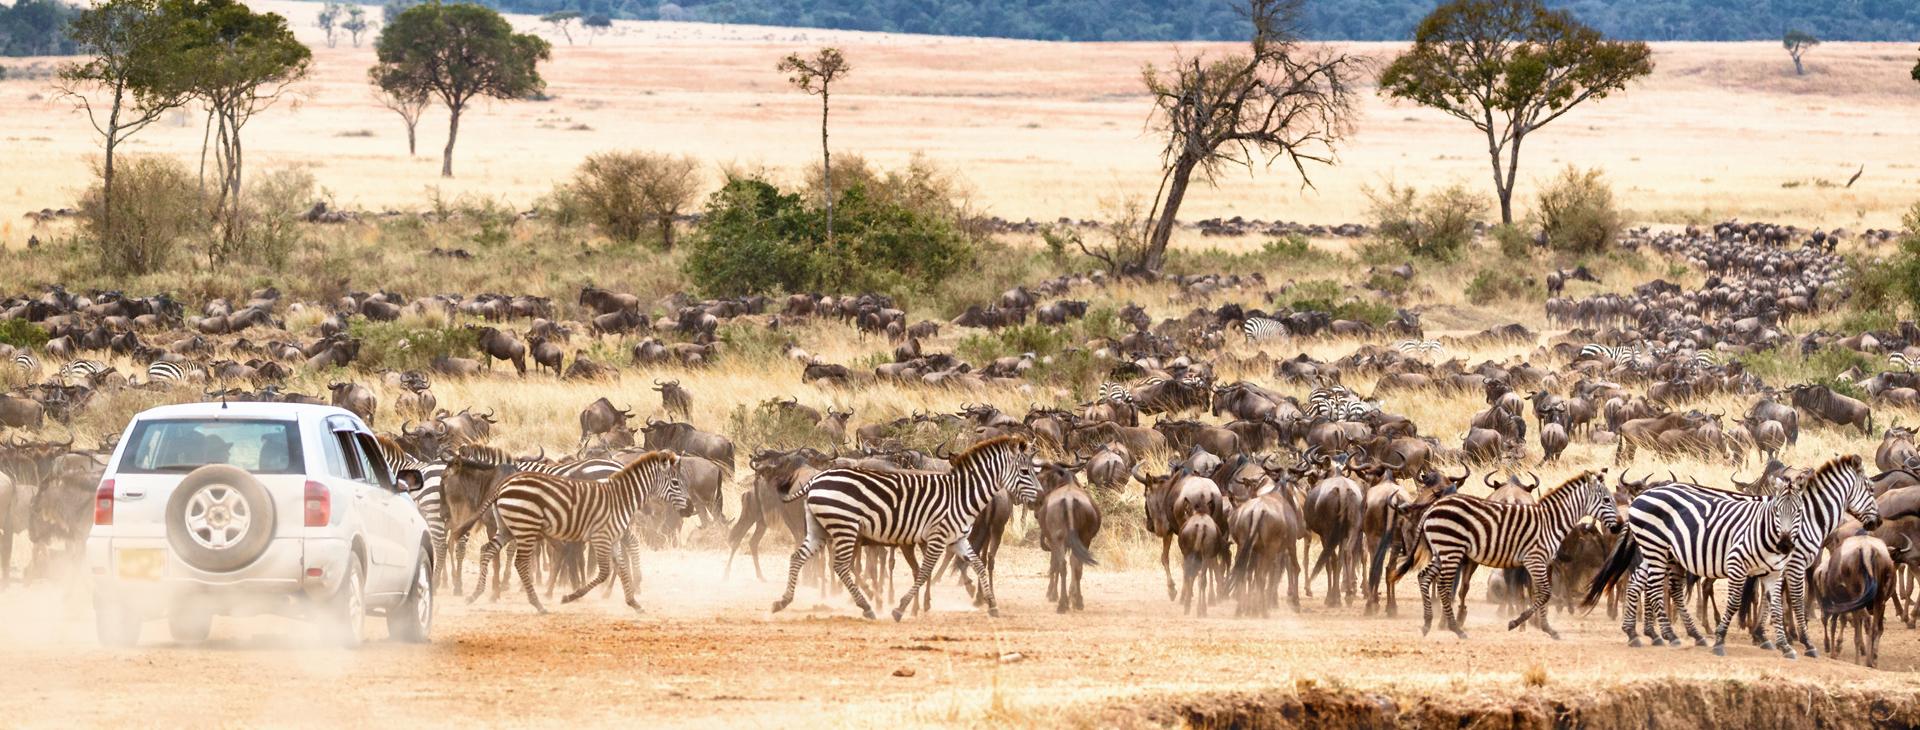 African Safari Self Game Drive.jpg